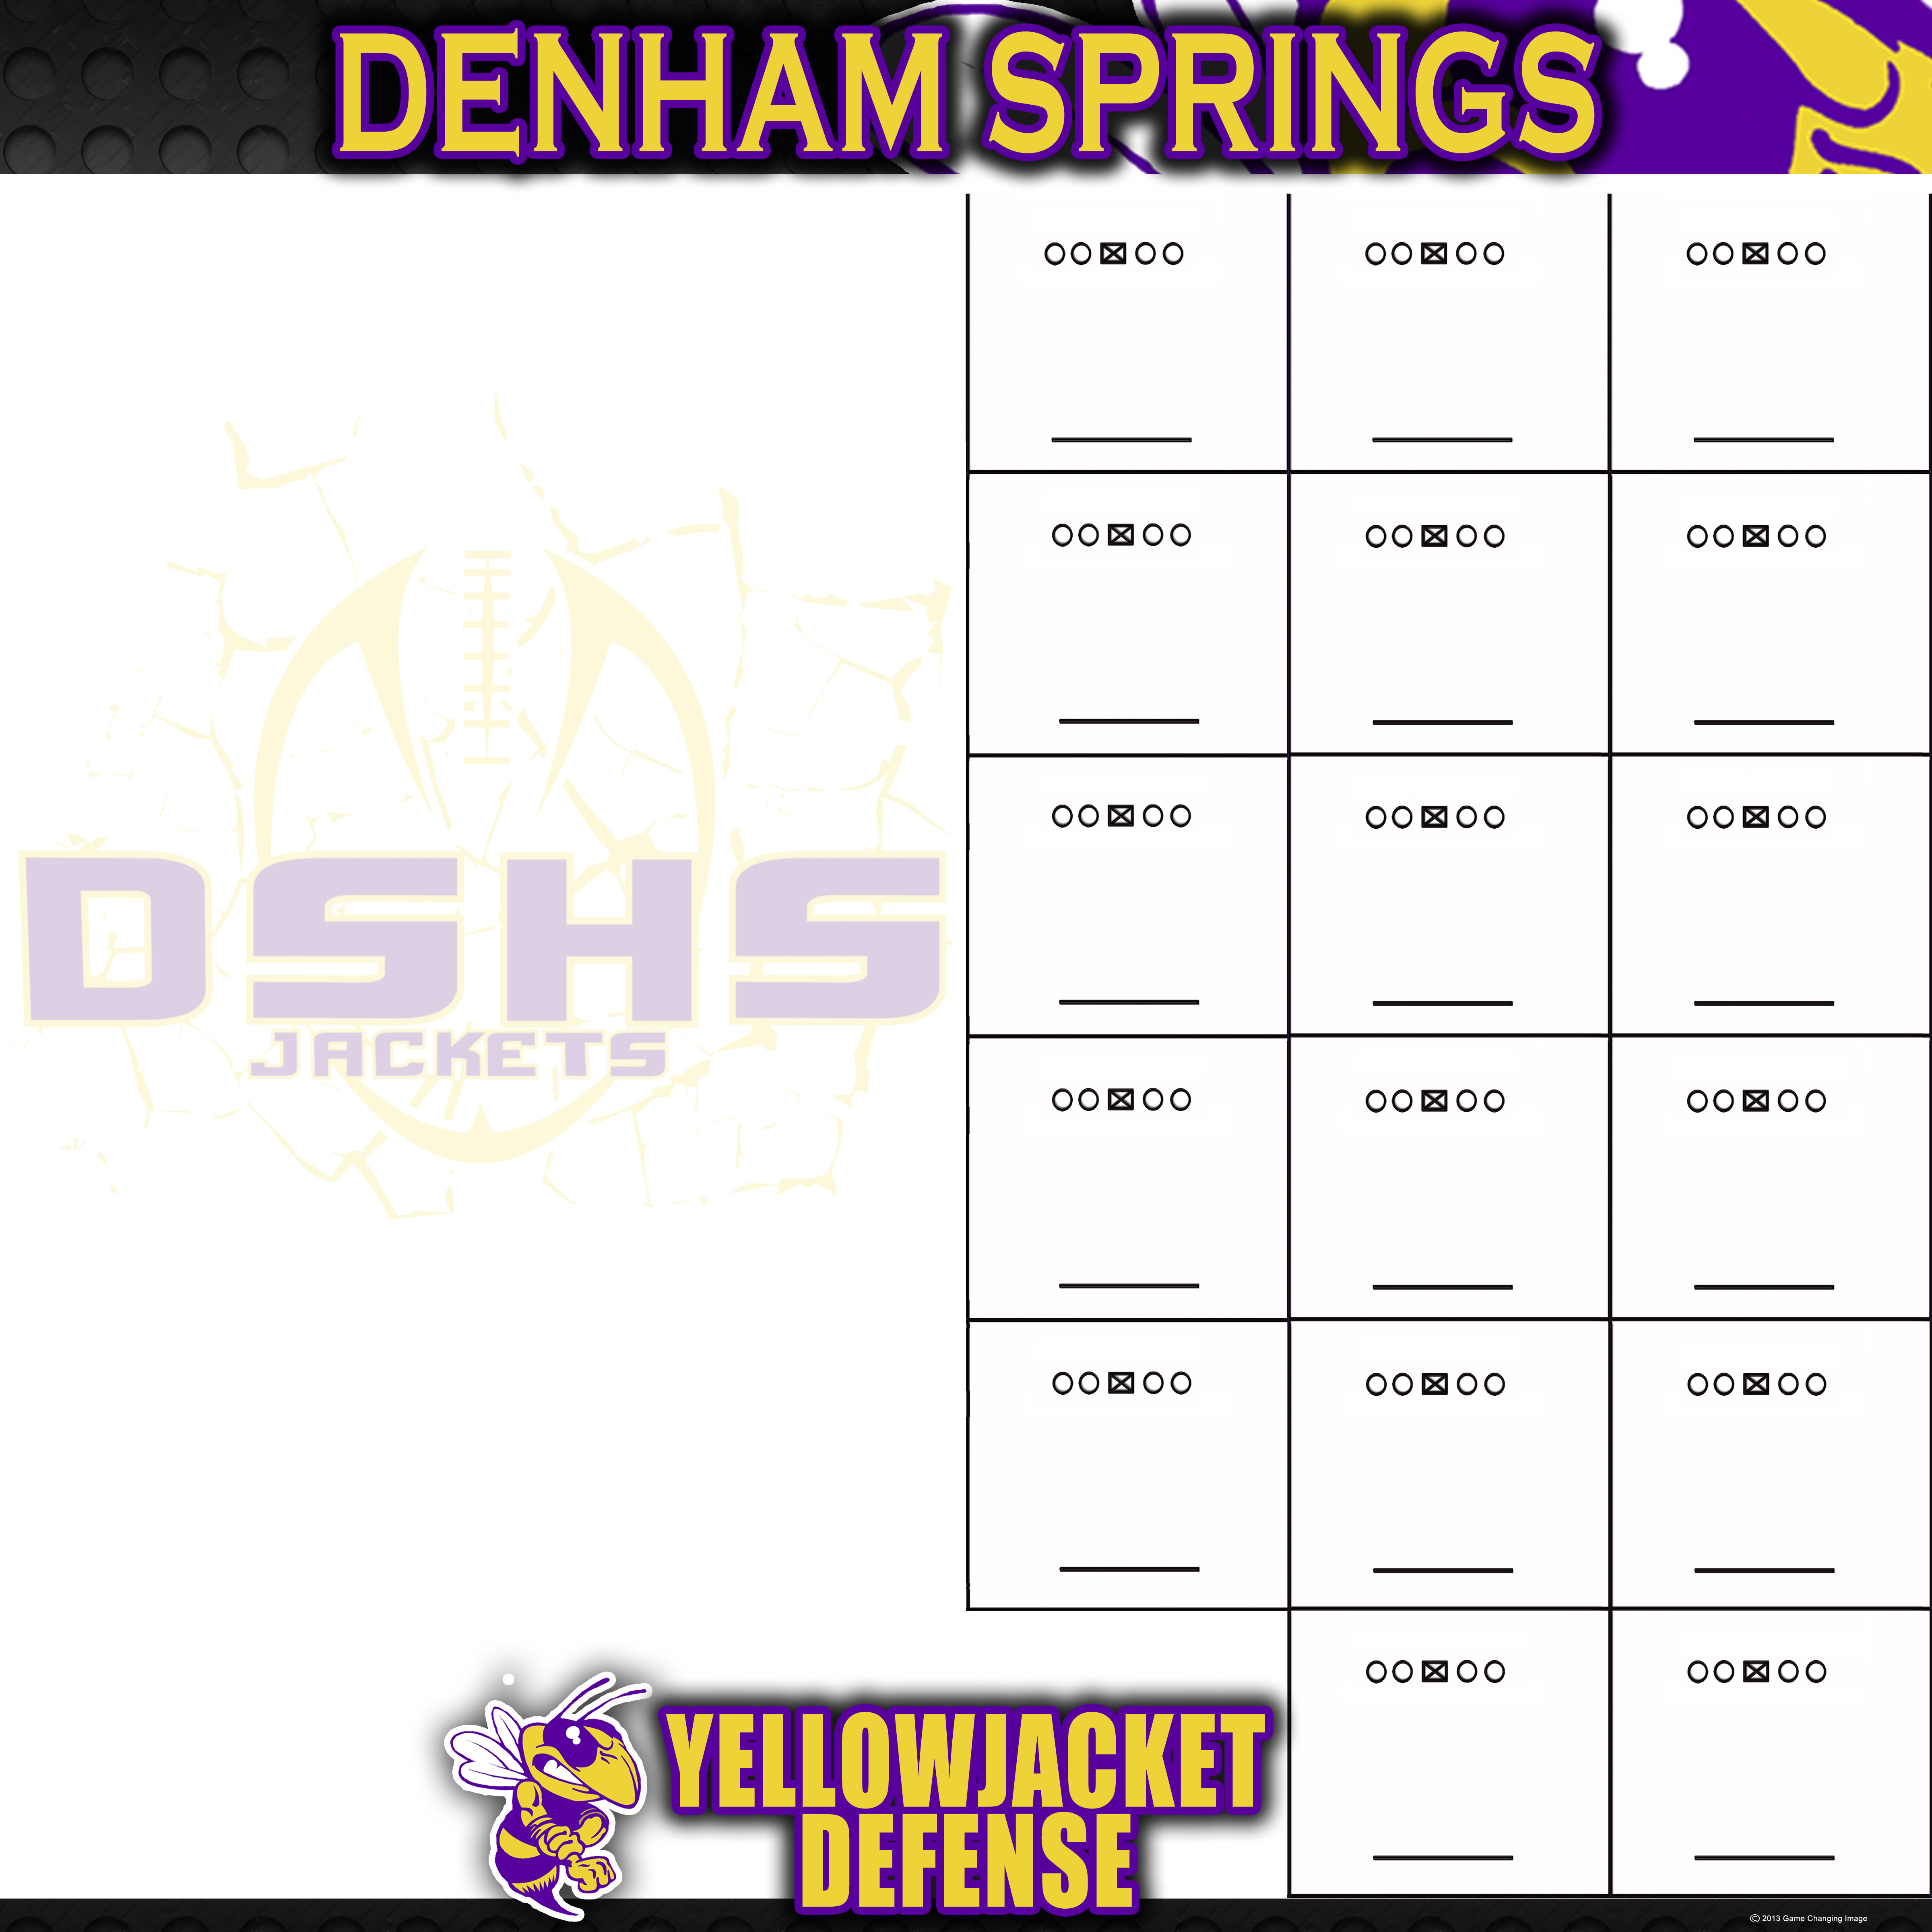 Denham Springs D plan 4x4